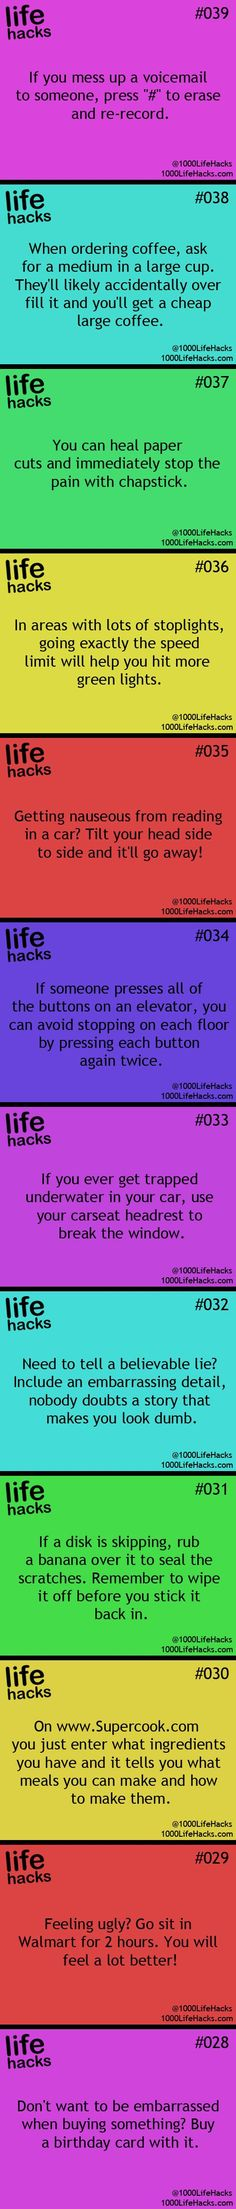 25 Useful Life Hacks… HAHA the last one